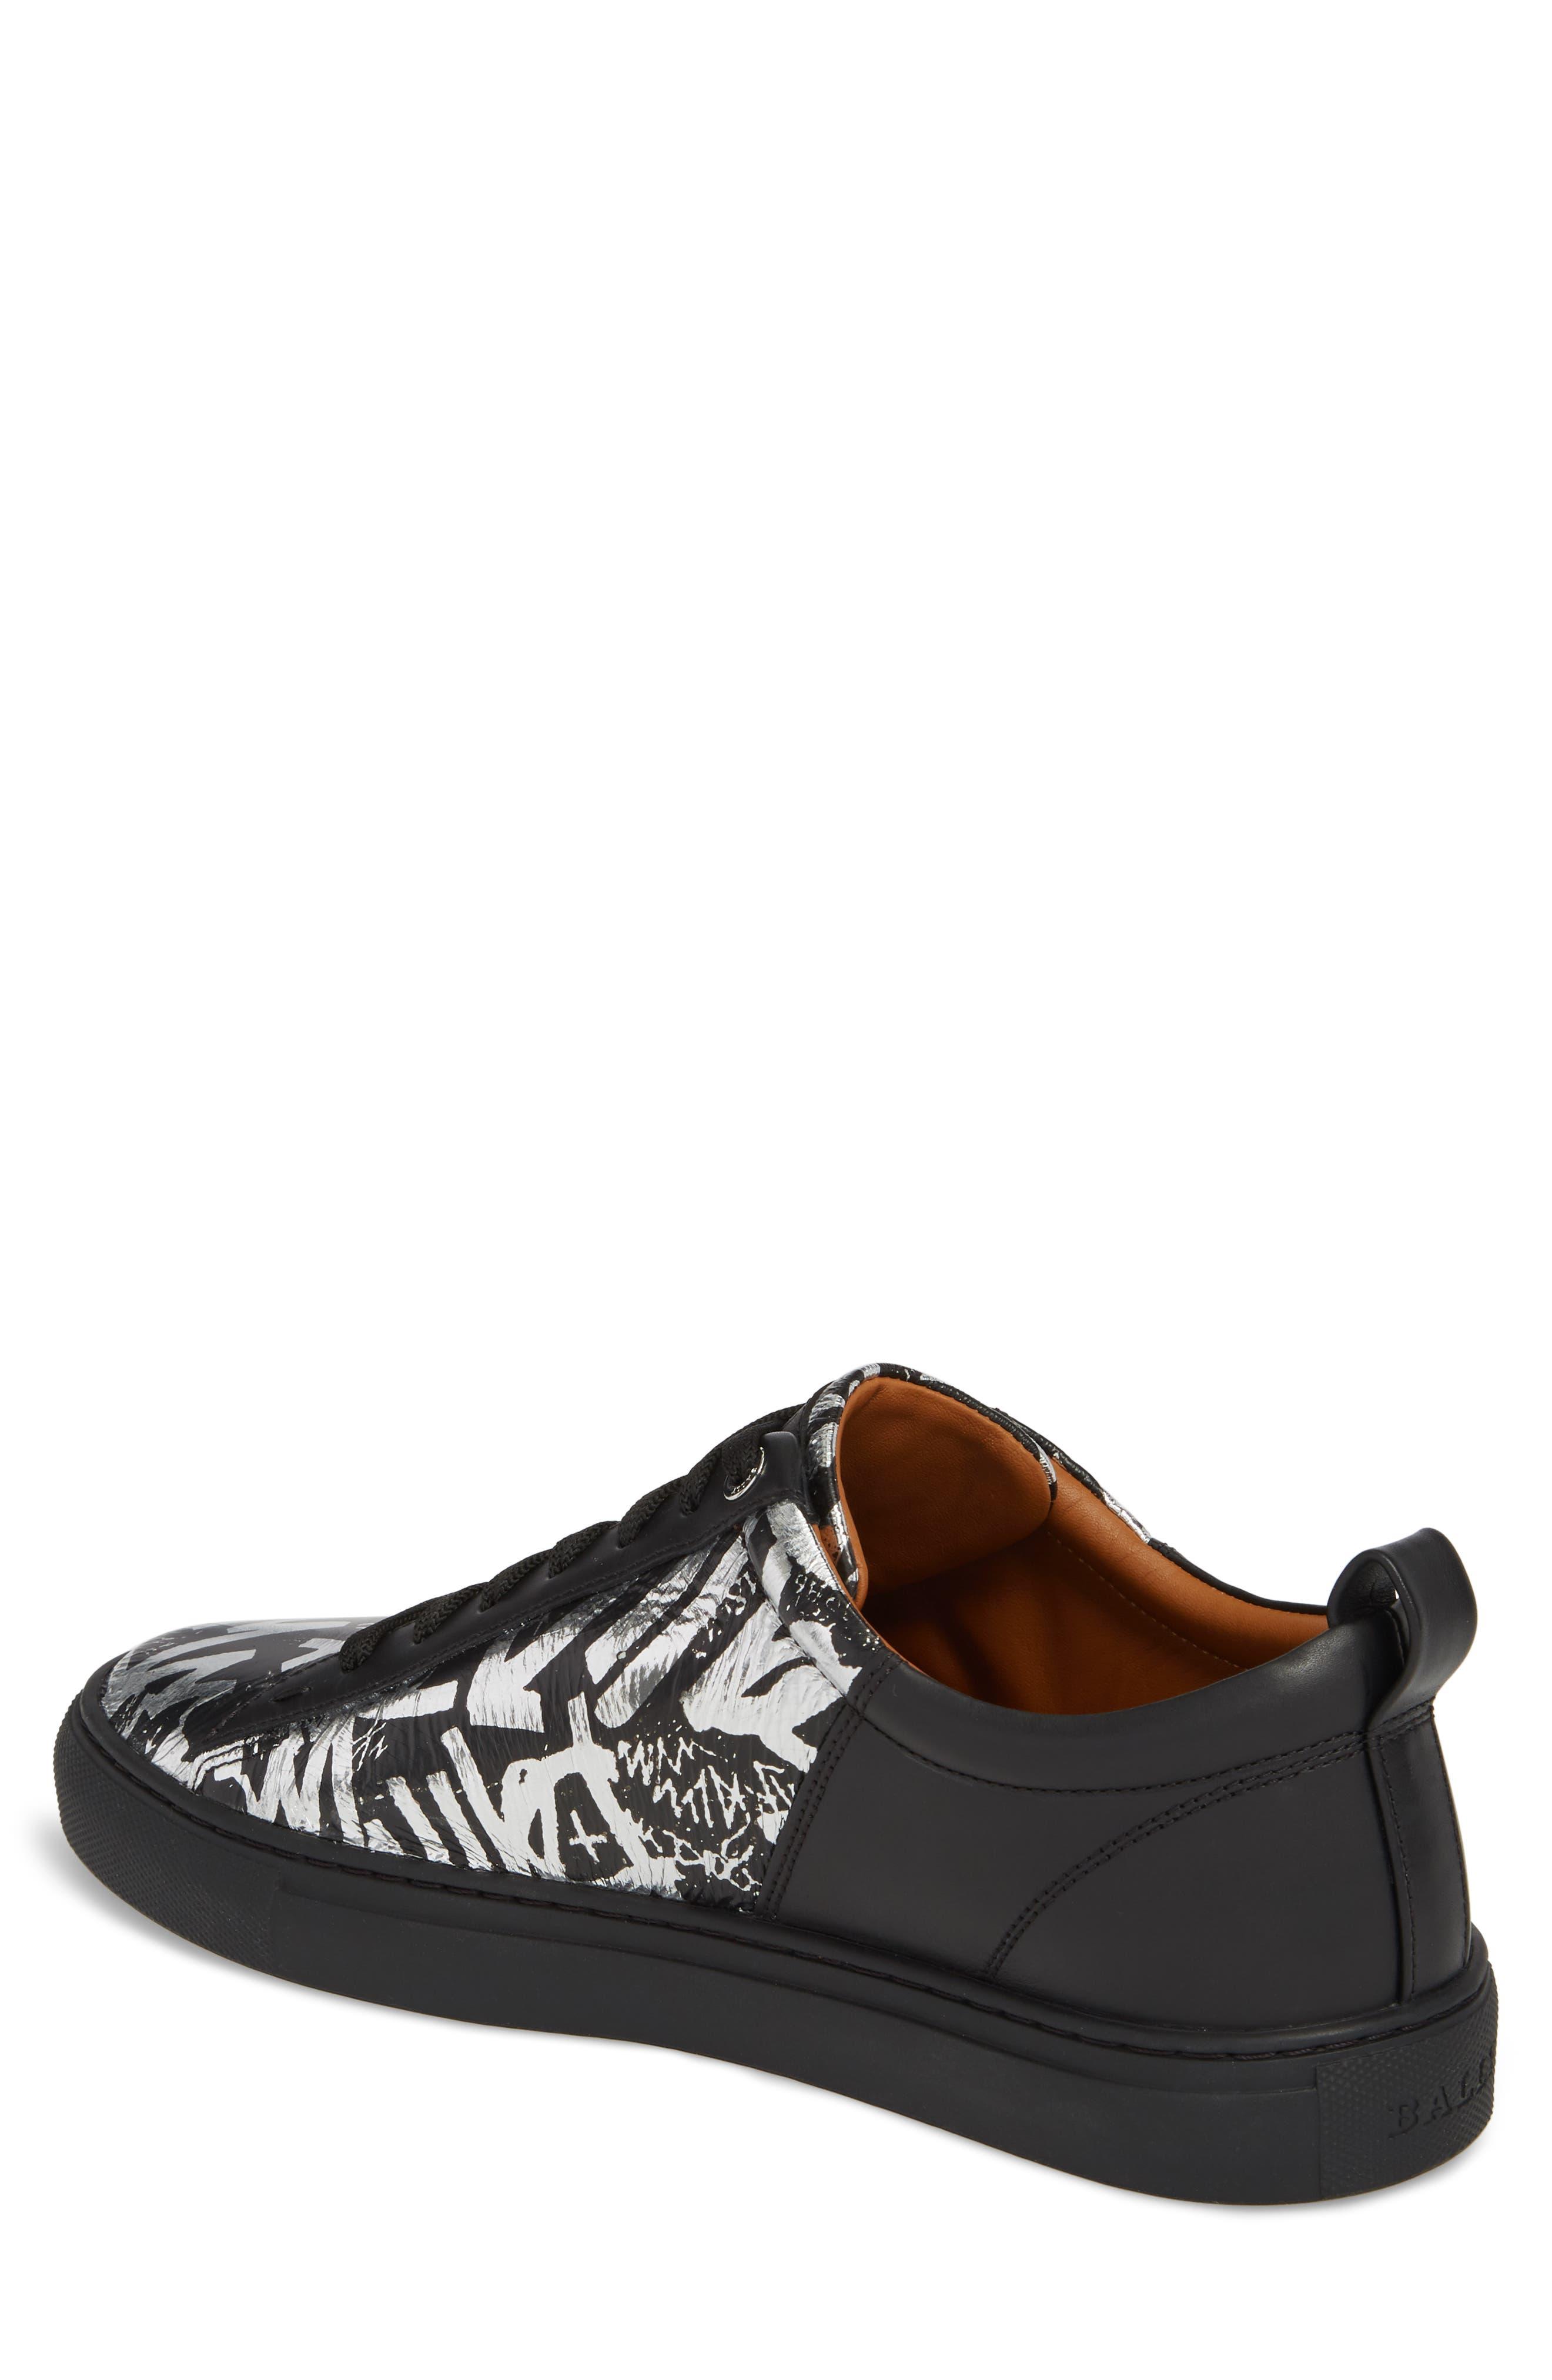 Herbi Low Top Sneaker,                             Alternate thumbnail 2, color,                             Silver